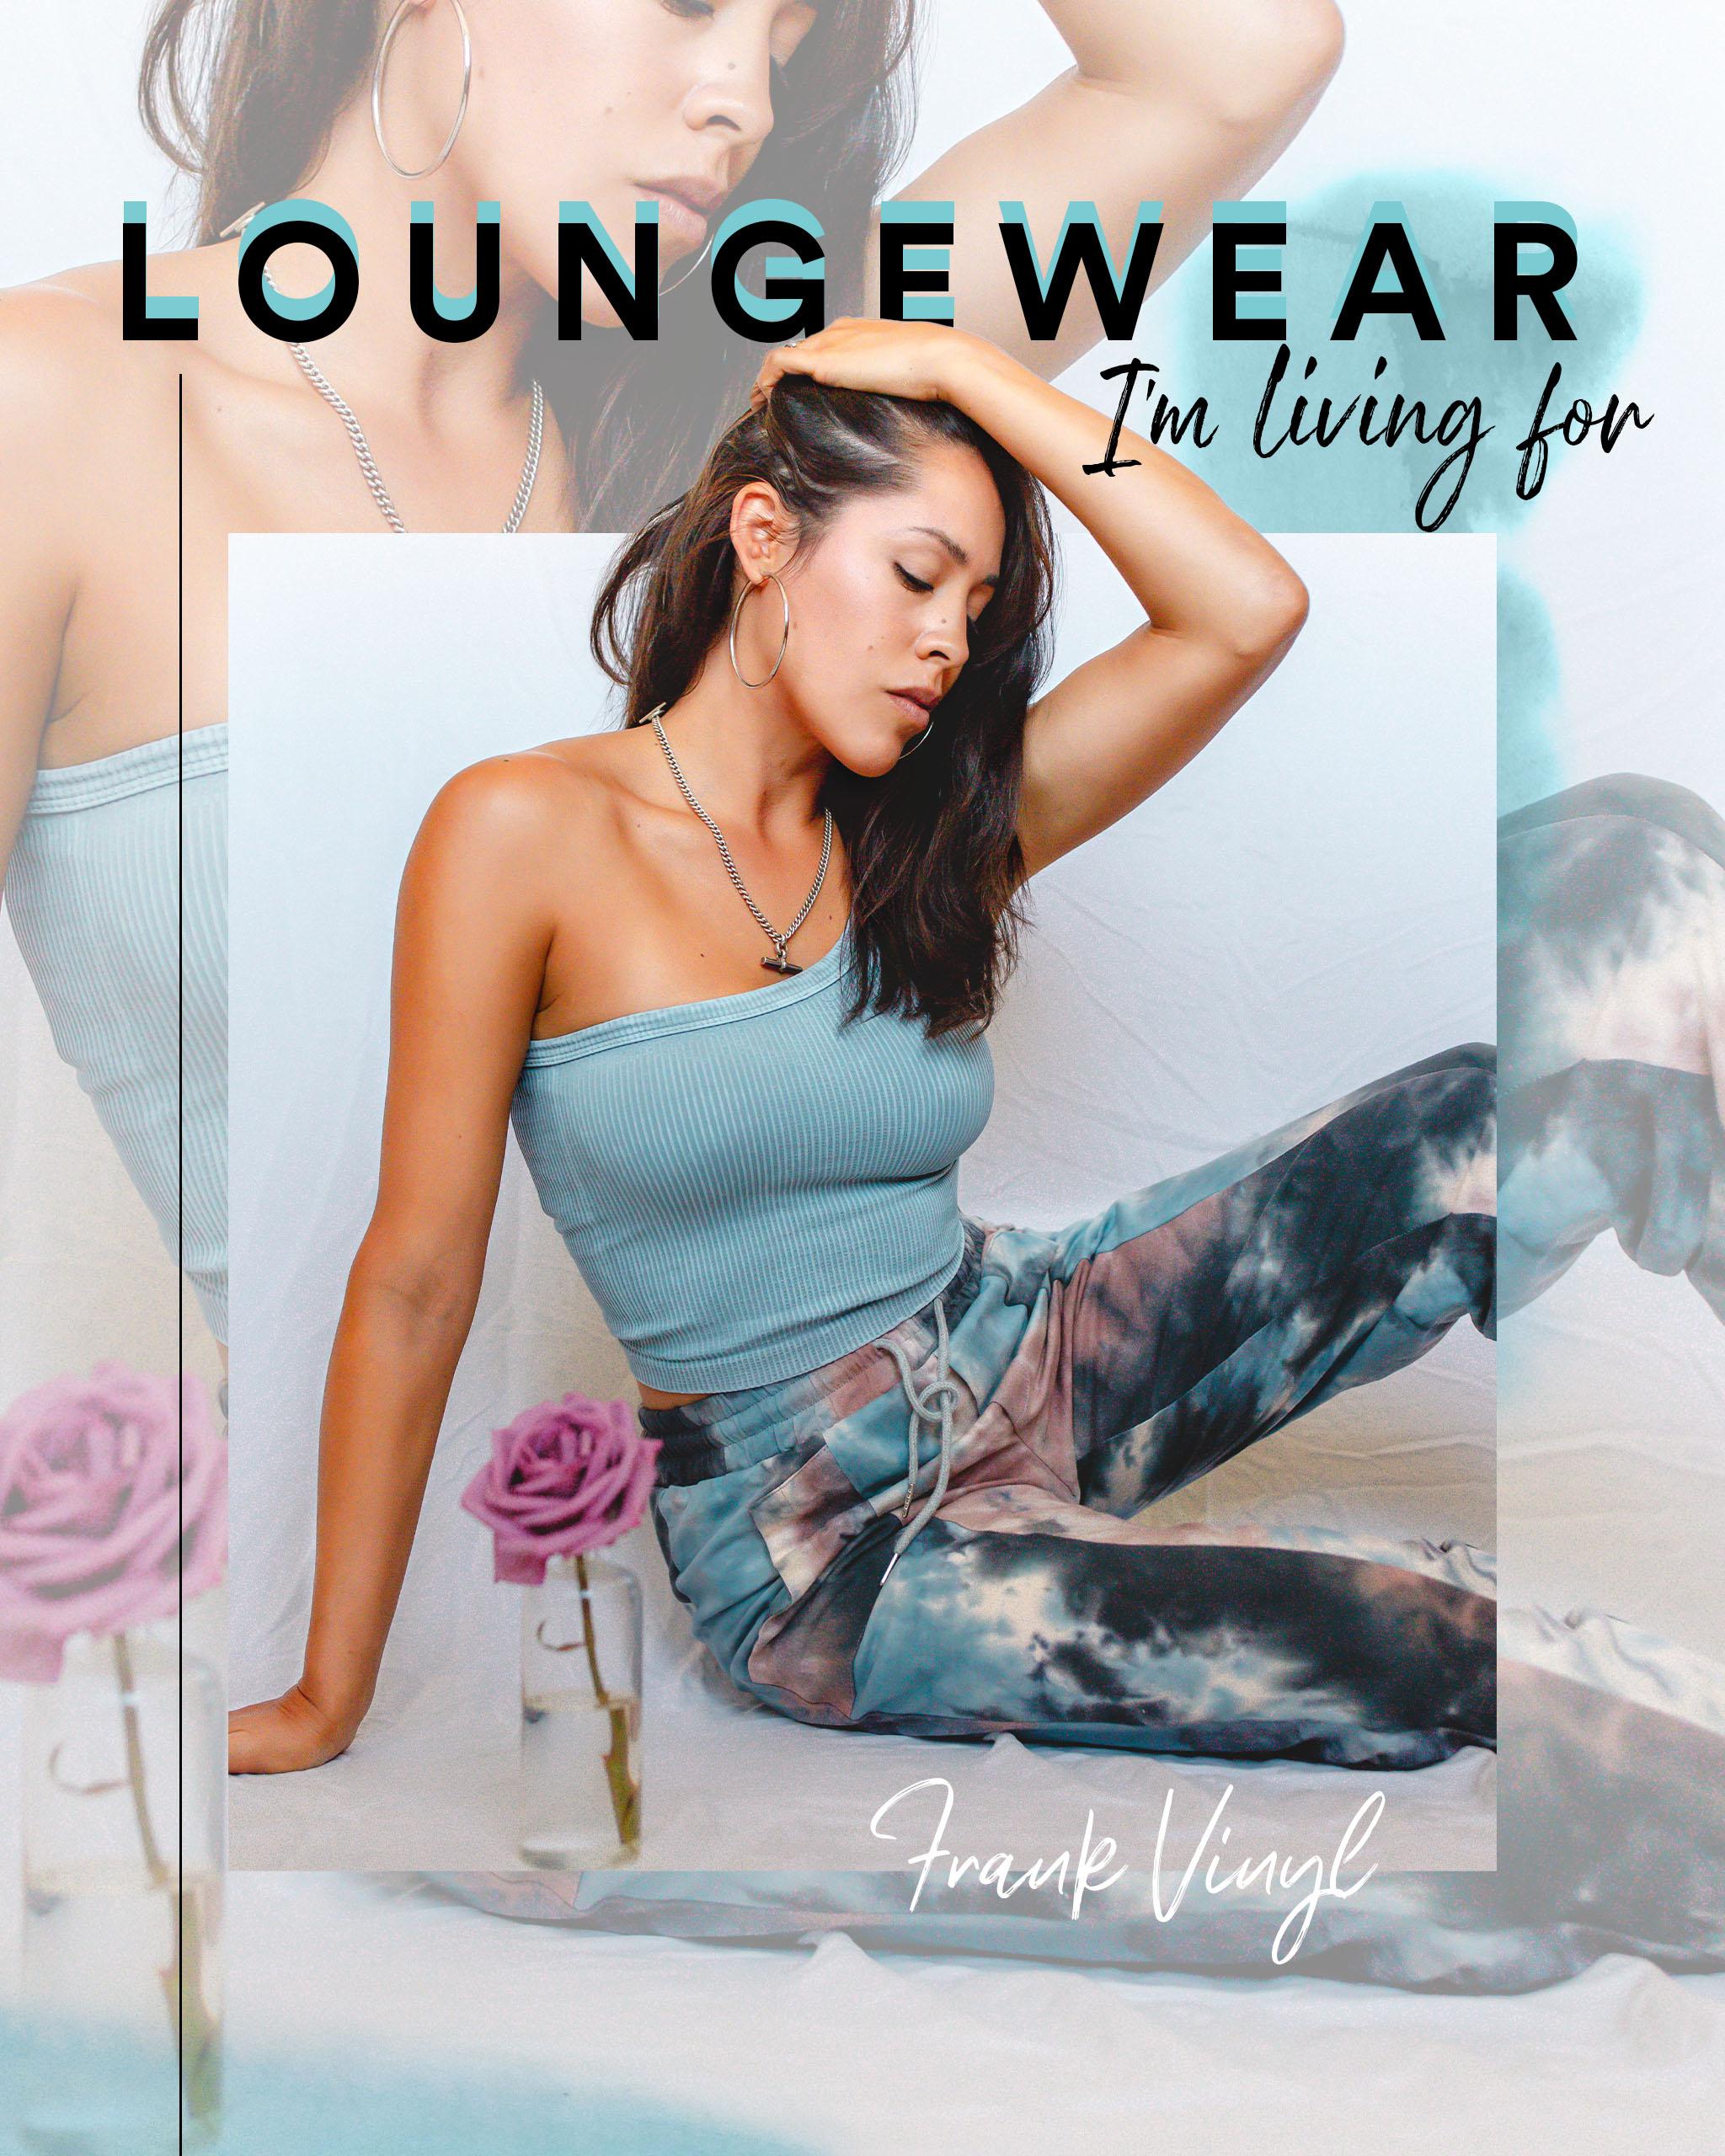 Loungewear I'm living for